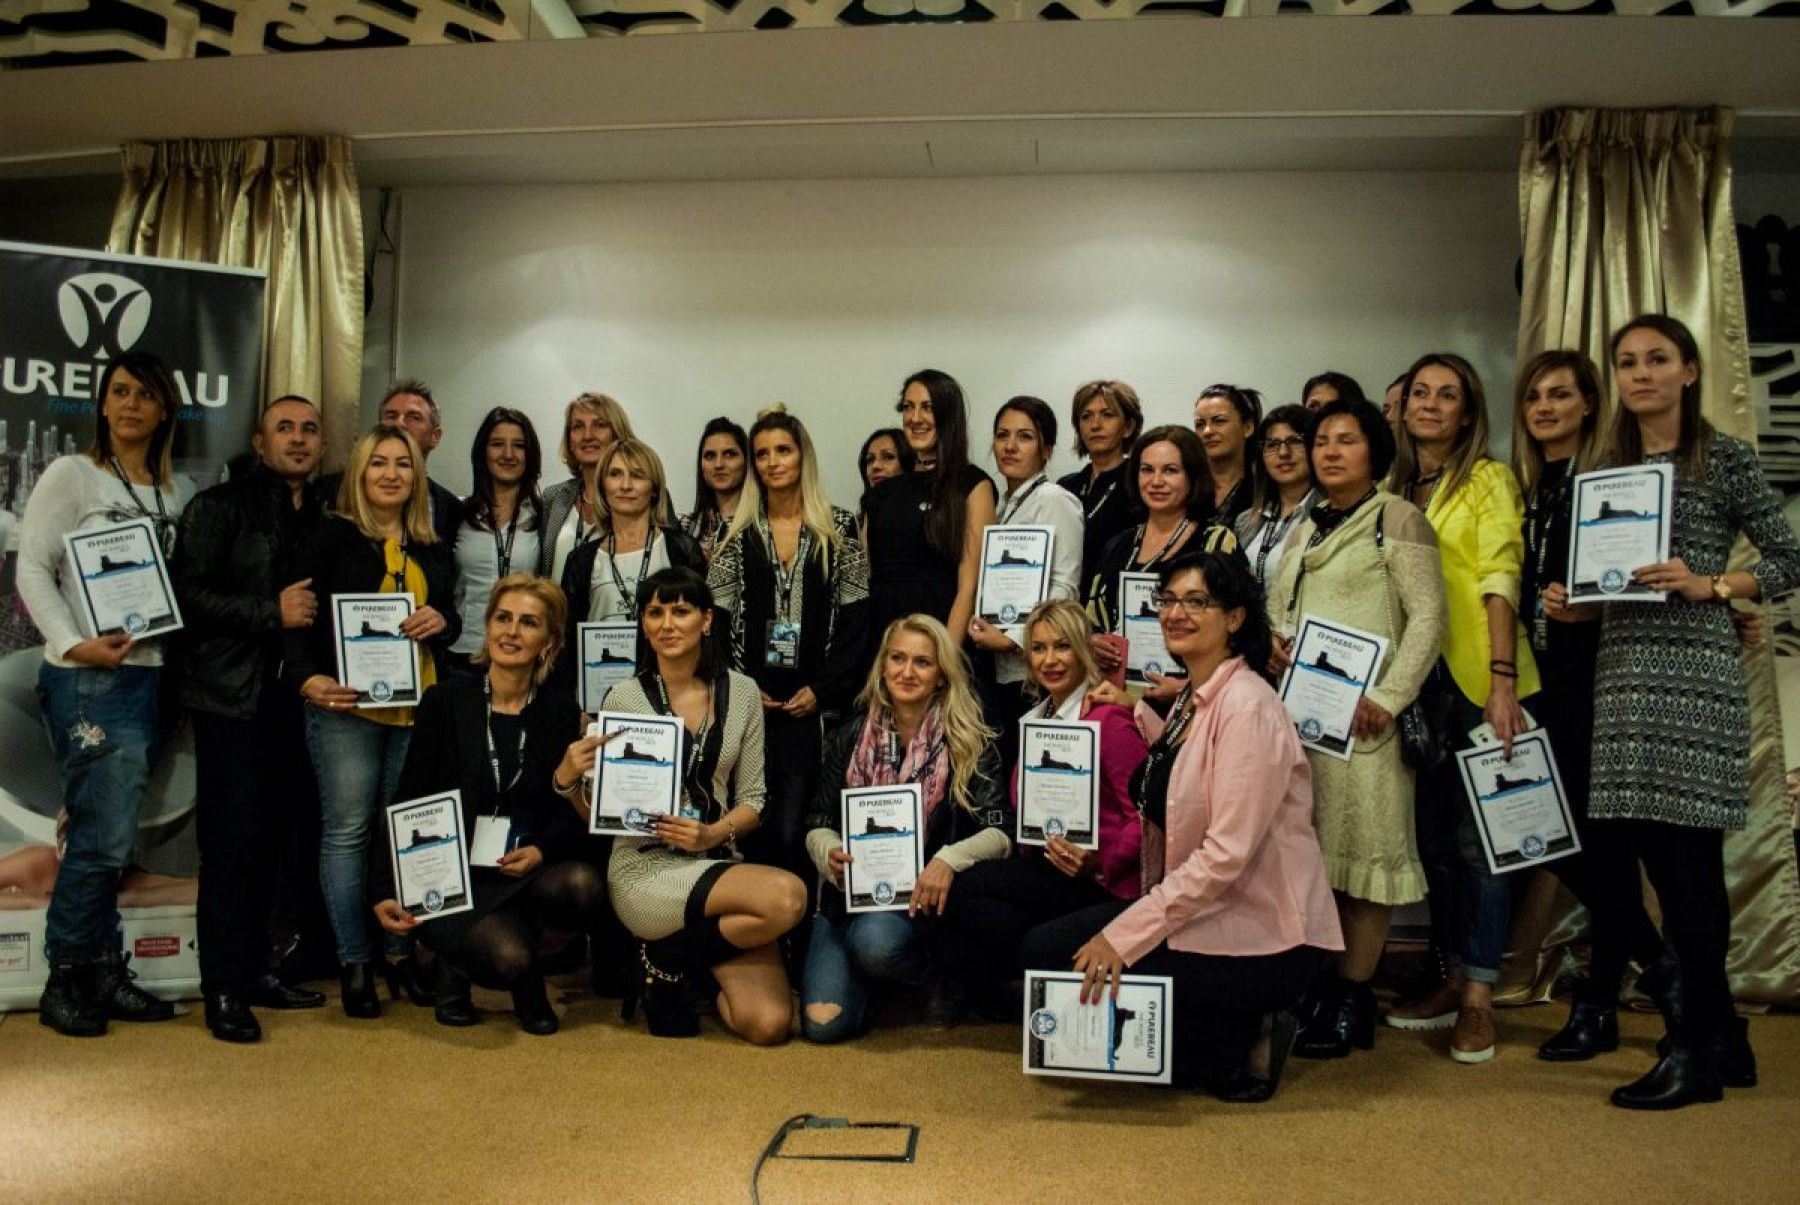 Učesnici Purebeau workshop-a